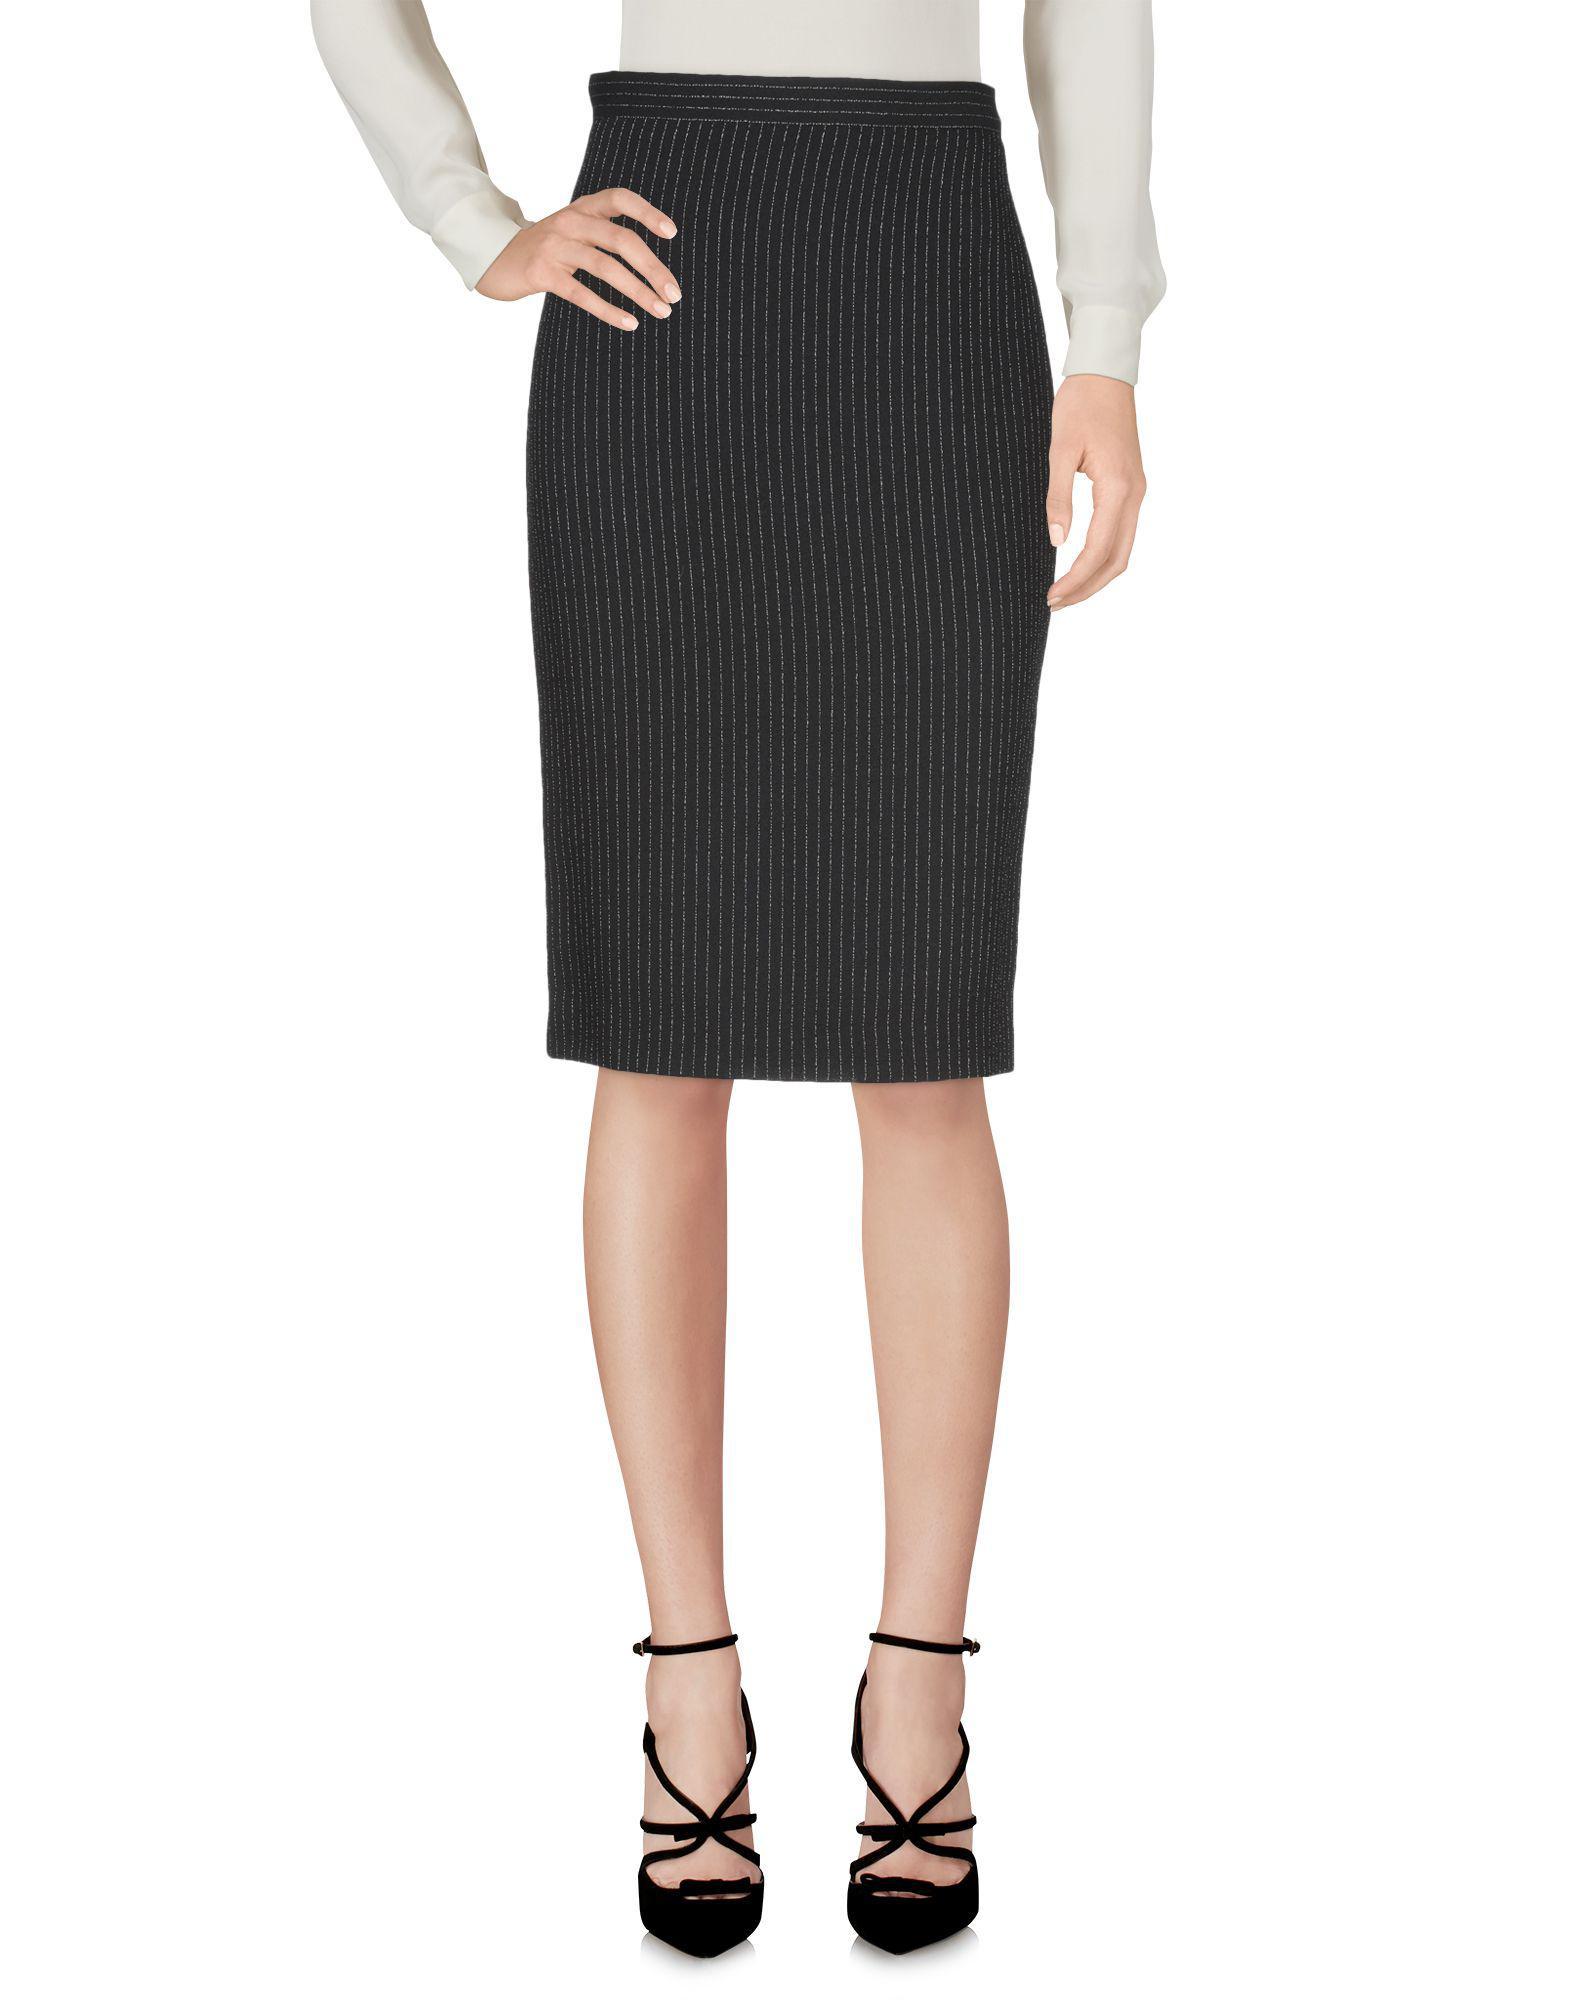 6ddd888347 Boutique Moschino - Black Knee Length Skirt - Lyst. View fullscreen